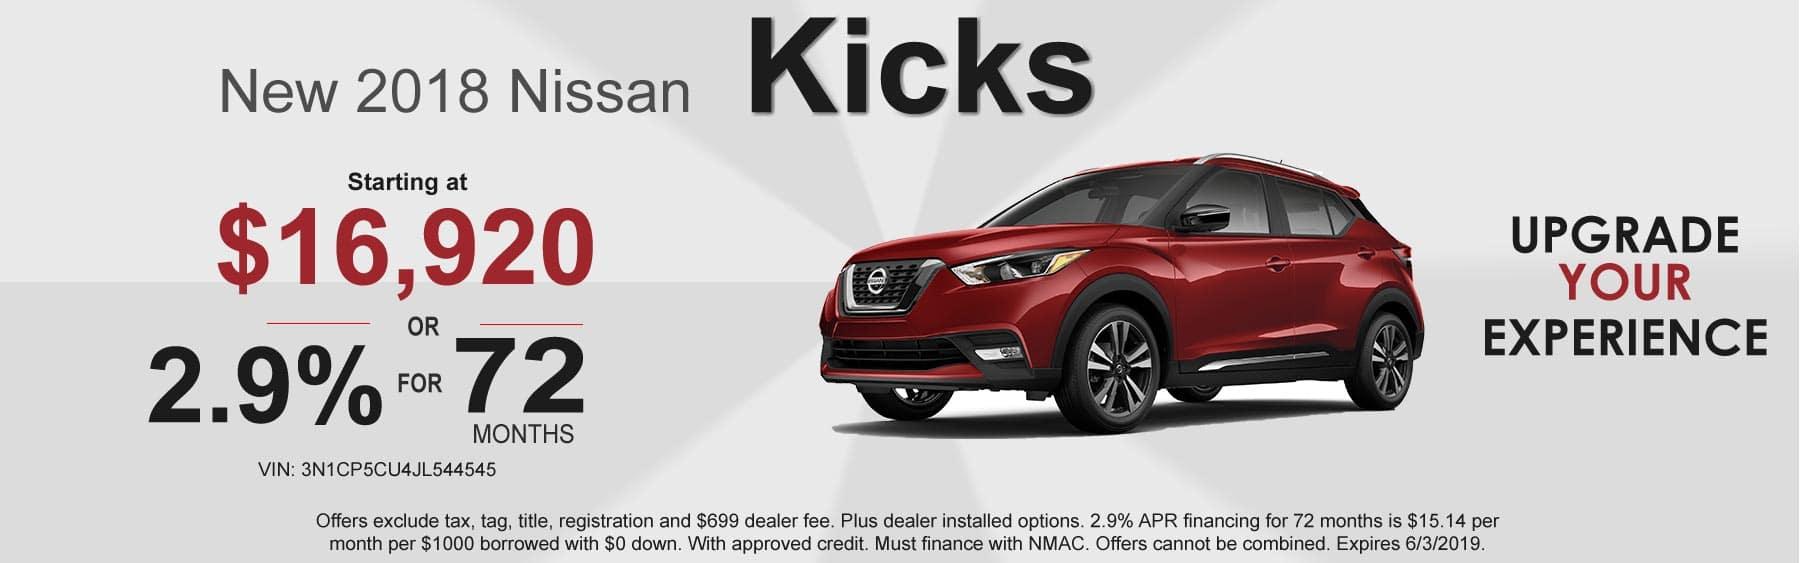 2018 Nissan Kicks offers - Kicks for sale in Boone